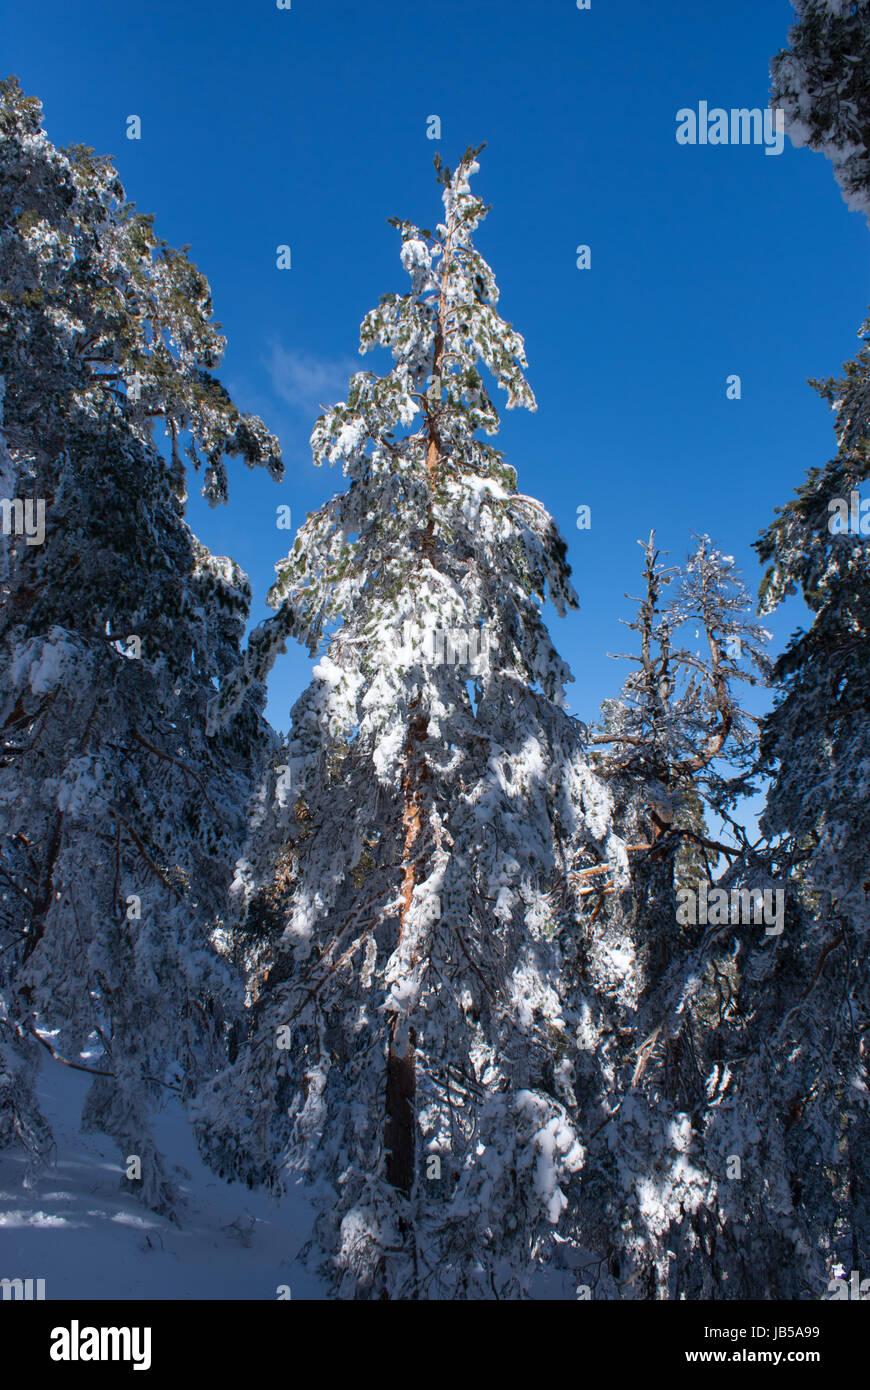 Snow in navacerrada madrid spain Stock Photo